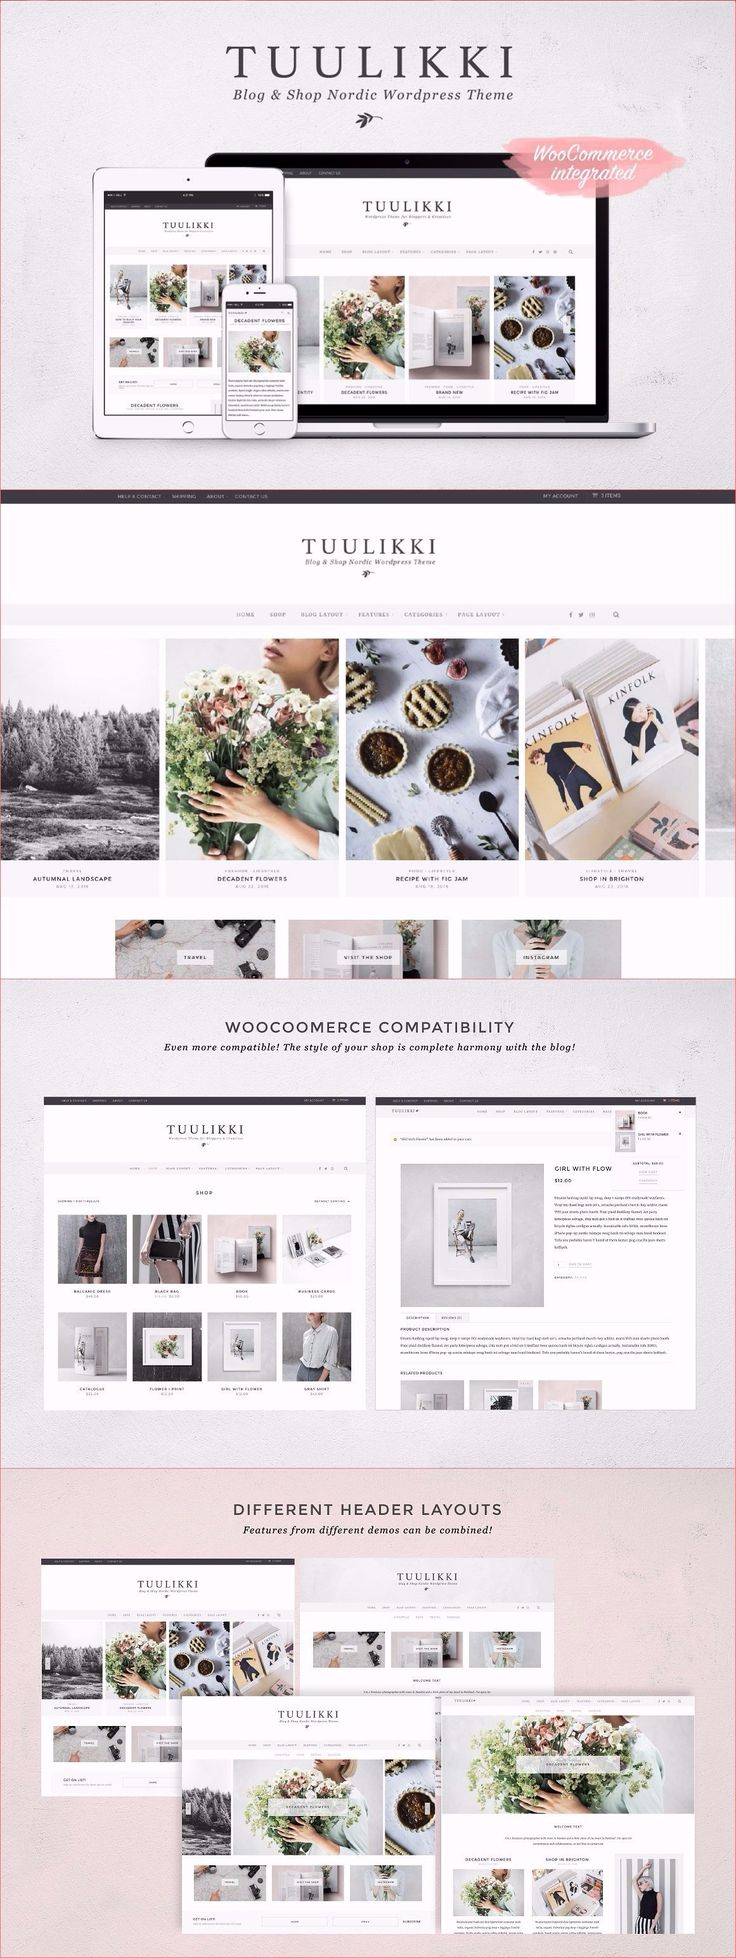 Tuulikki Wordpress Theme #wp #woocommerce #minimal #theme #template #ecommerce #blog #shop #nordic